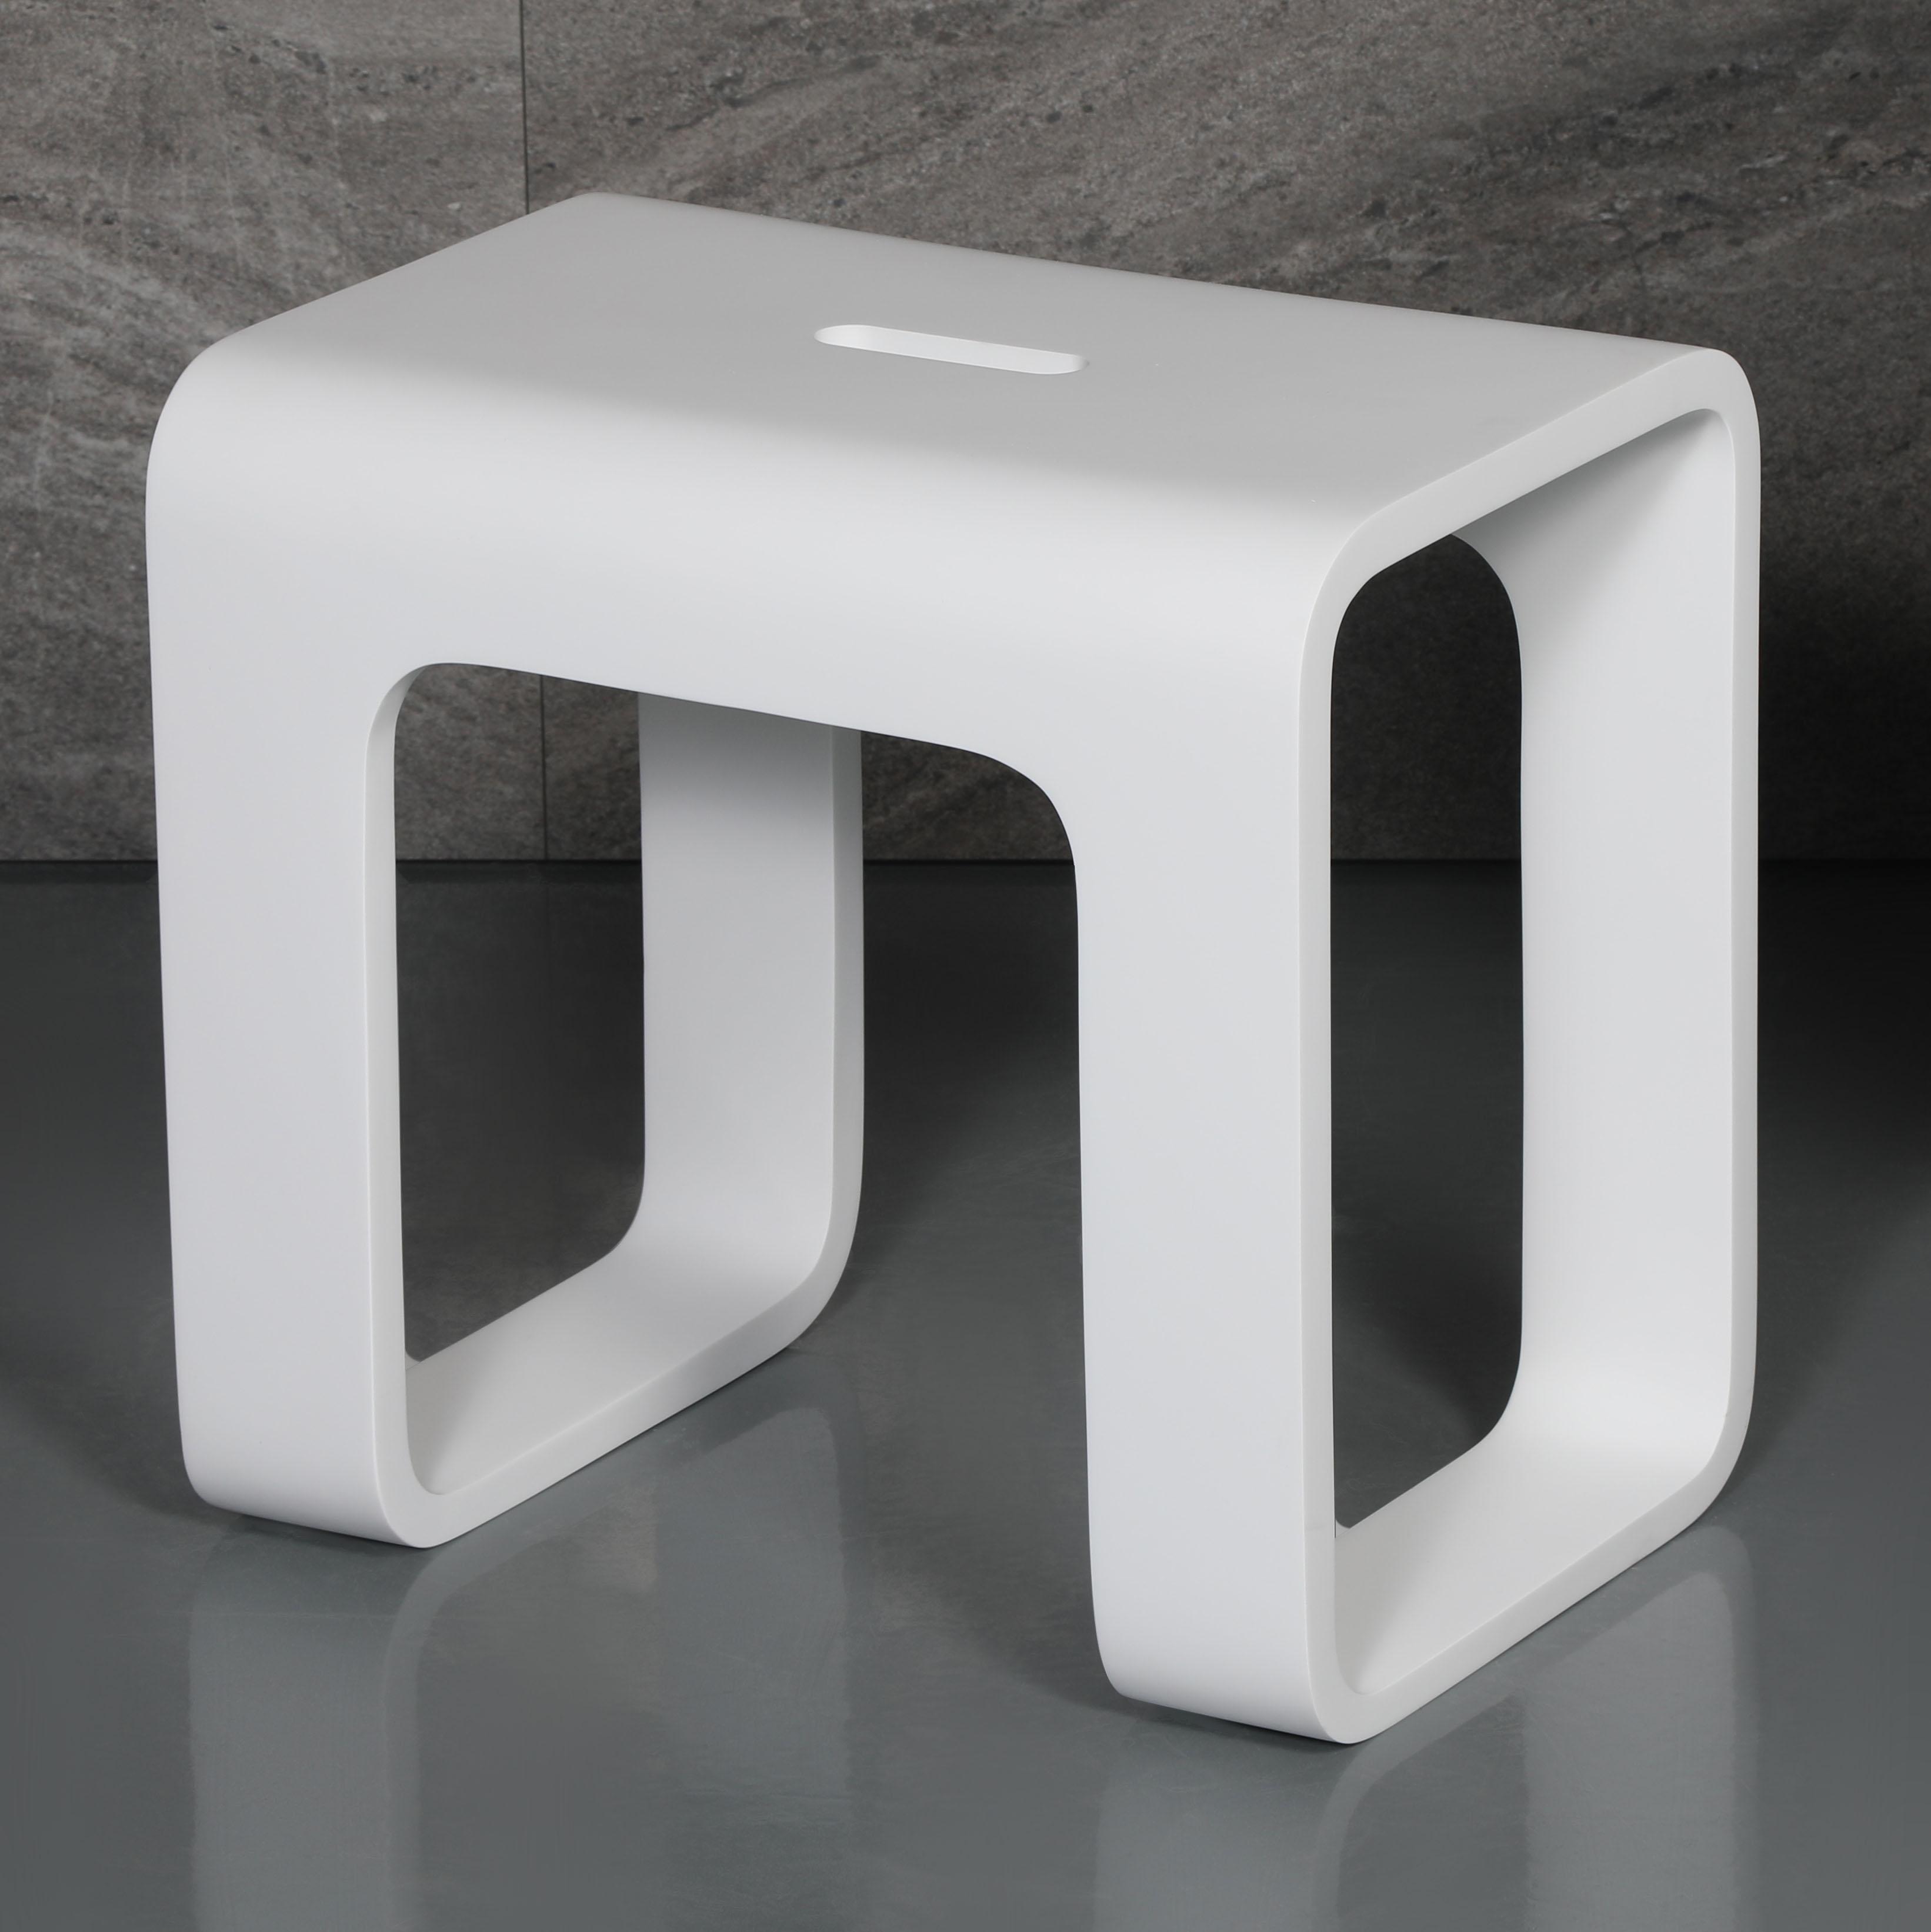 ALFI ABST99 Solid Surface Resin Bathroom & Shower Stool, White Matte